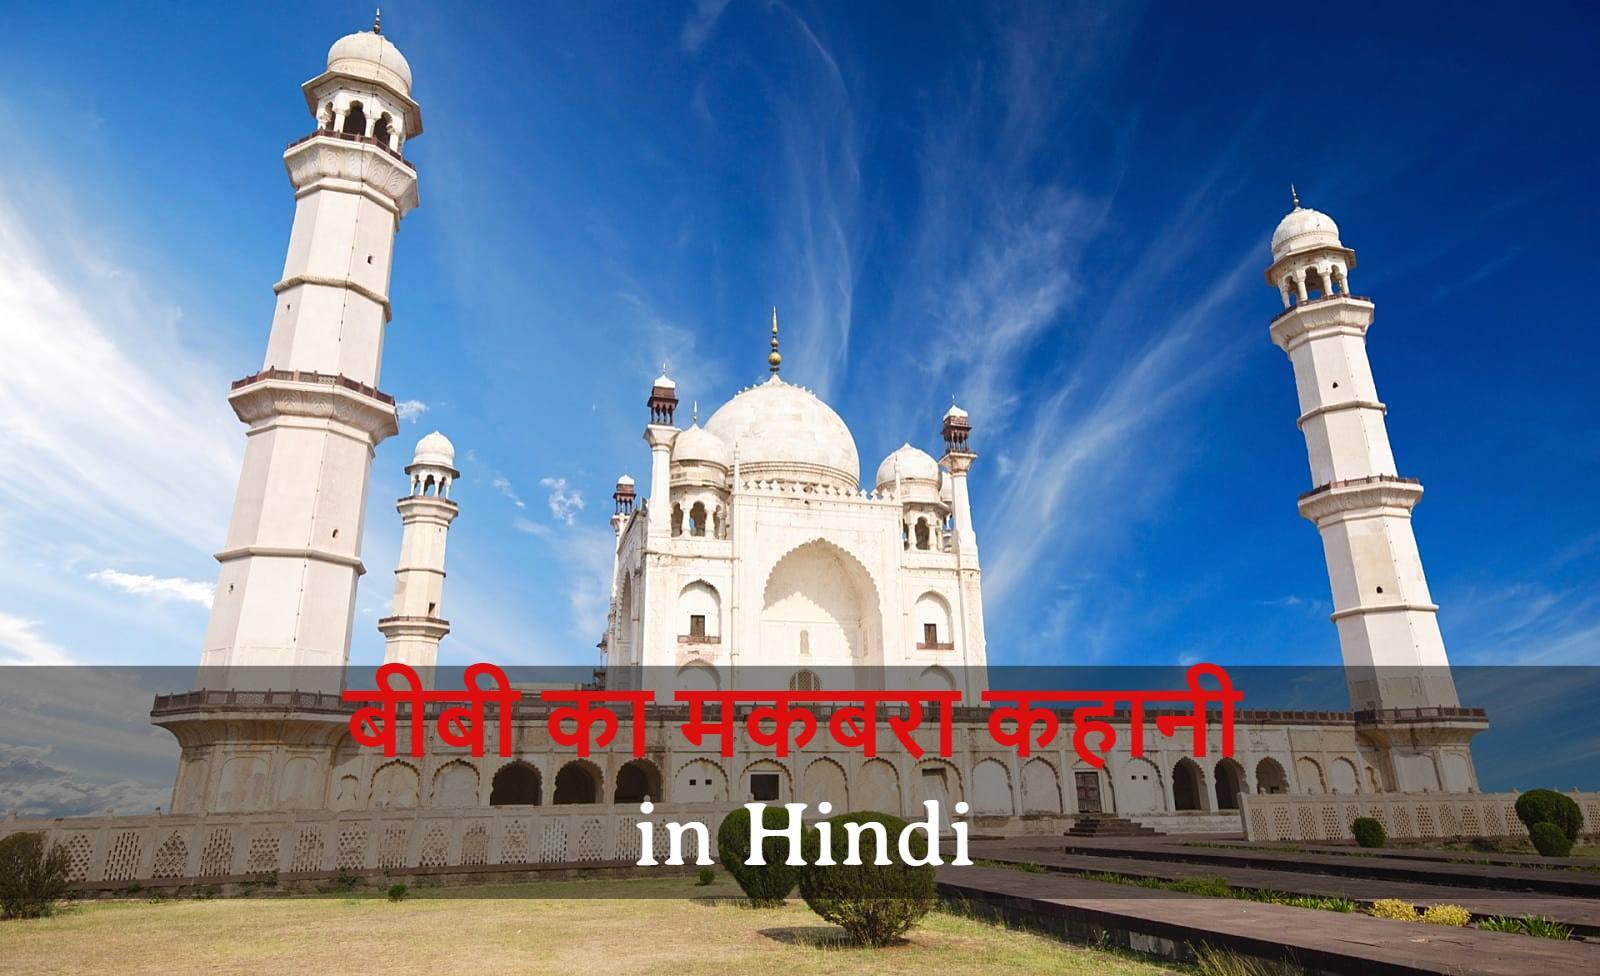 बीबी का मकबरा इतिहास - Bibi Ka Maqbara History in Hindi